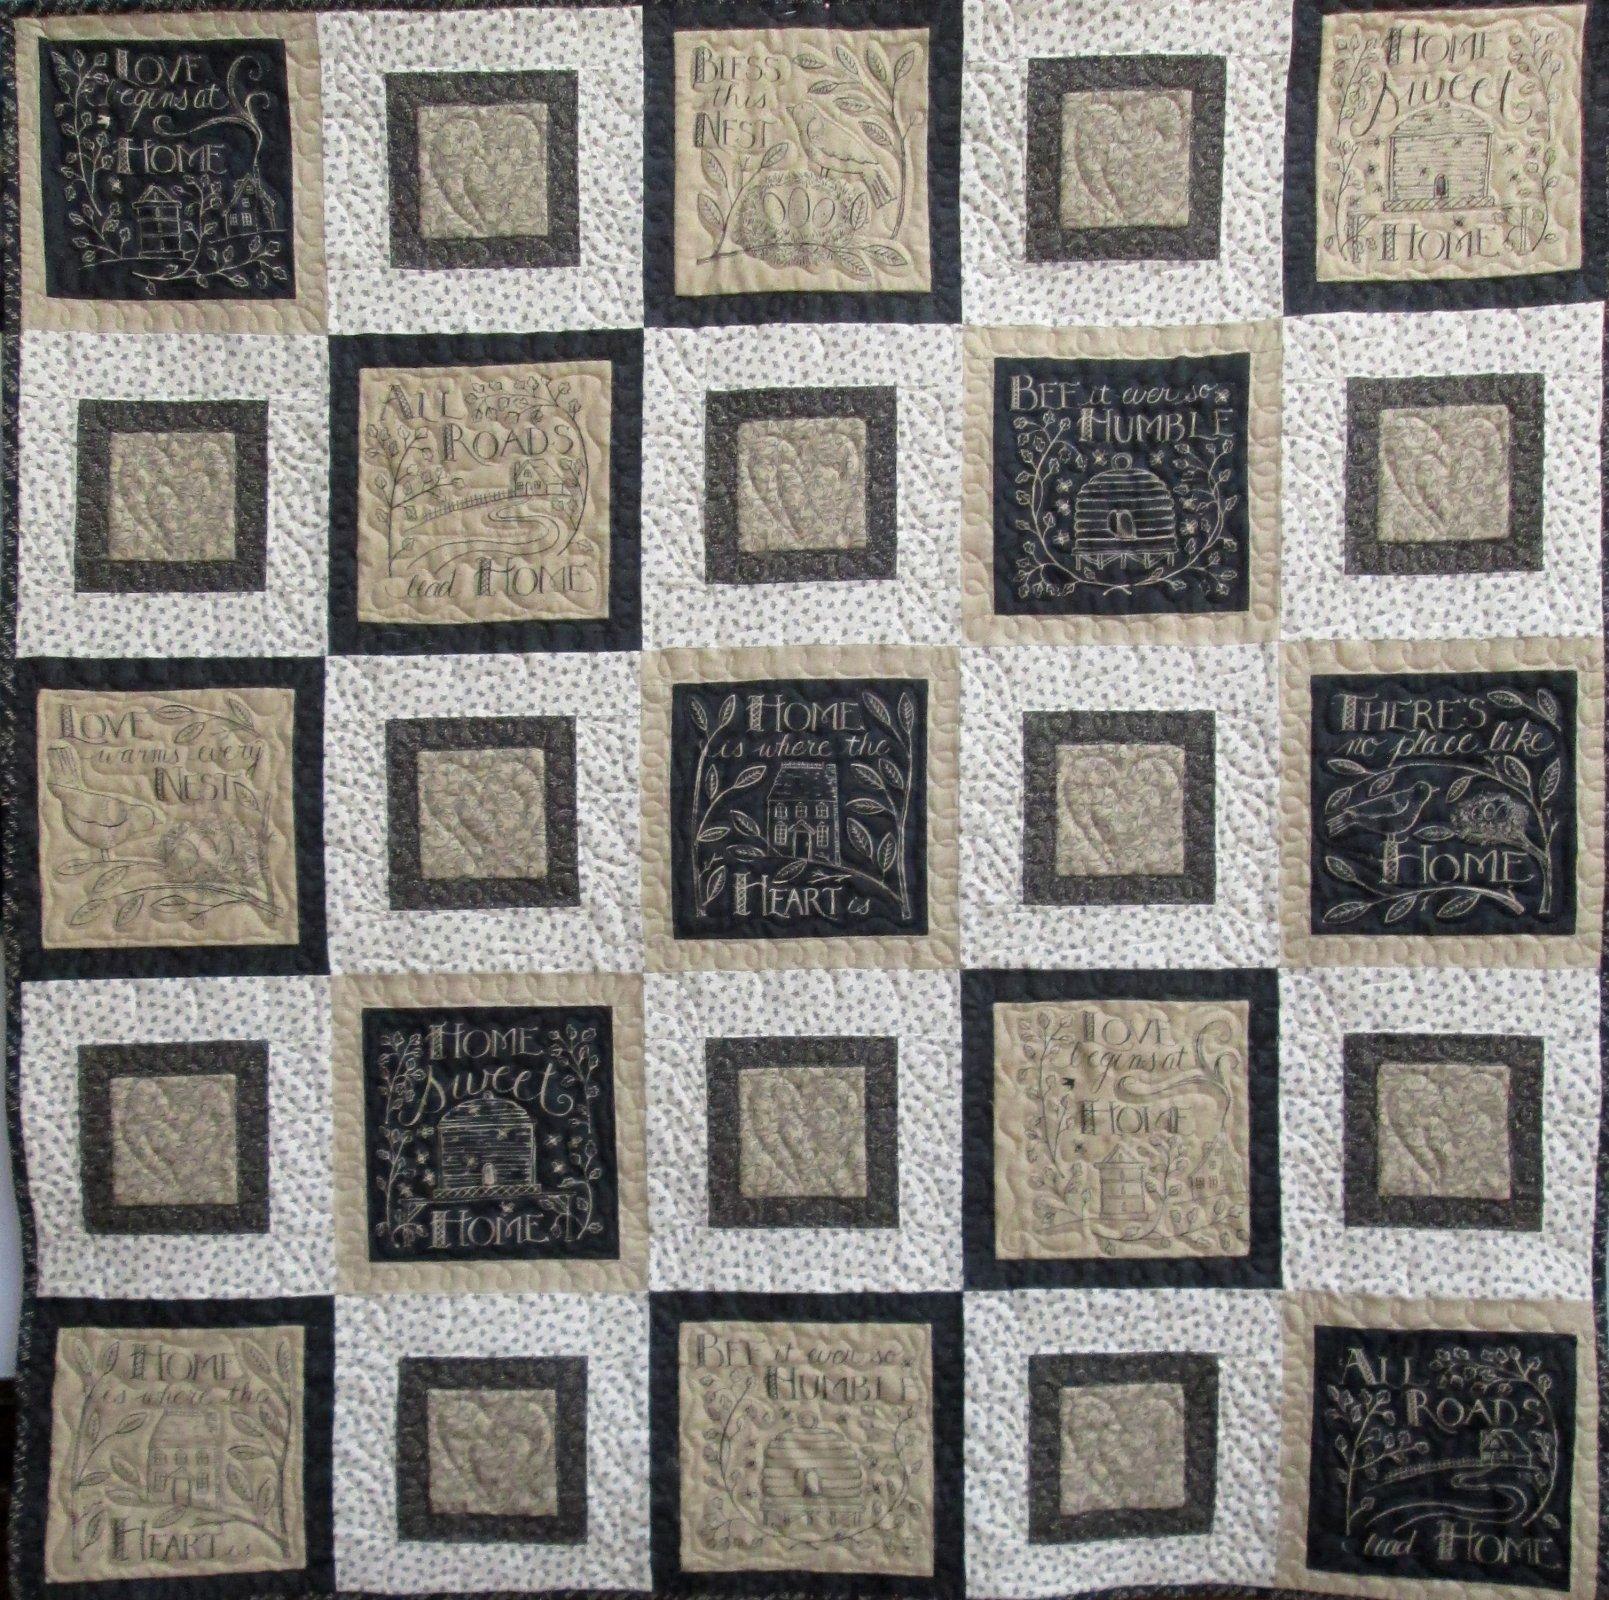 Home Squares Quilt Kit